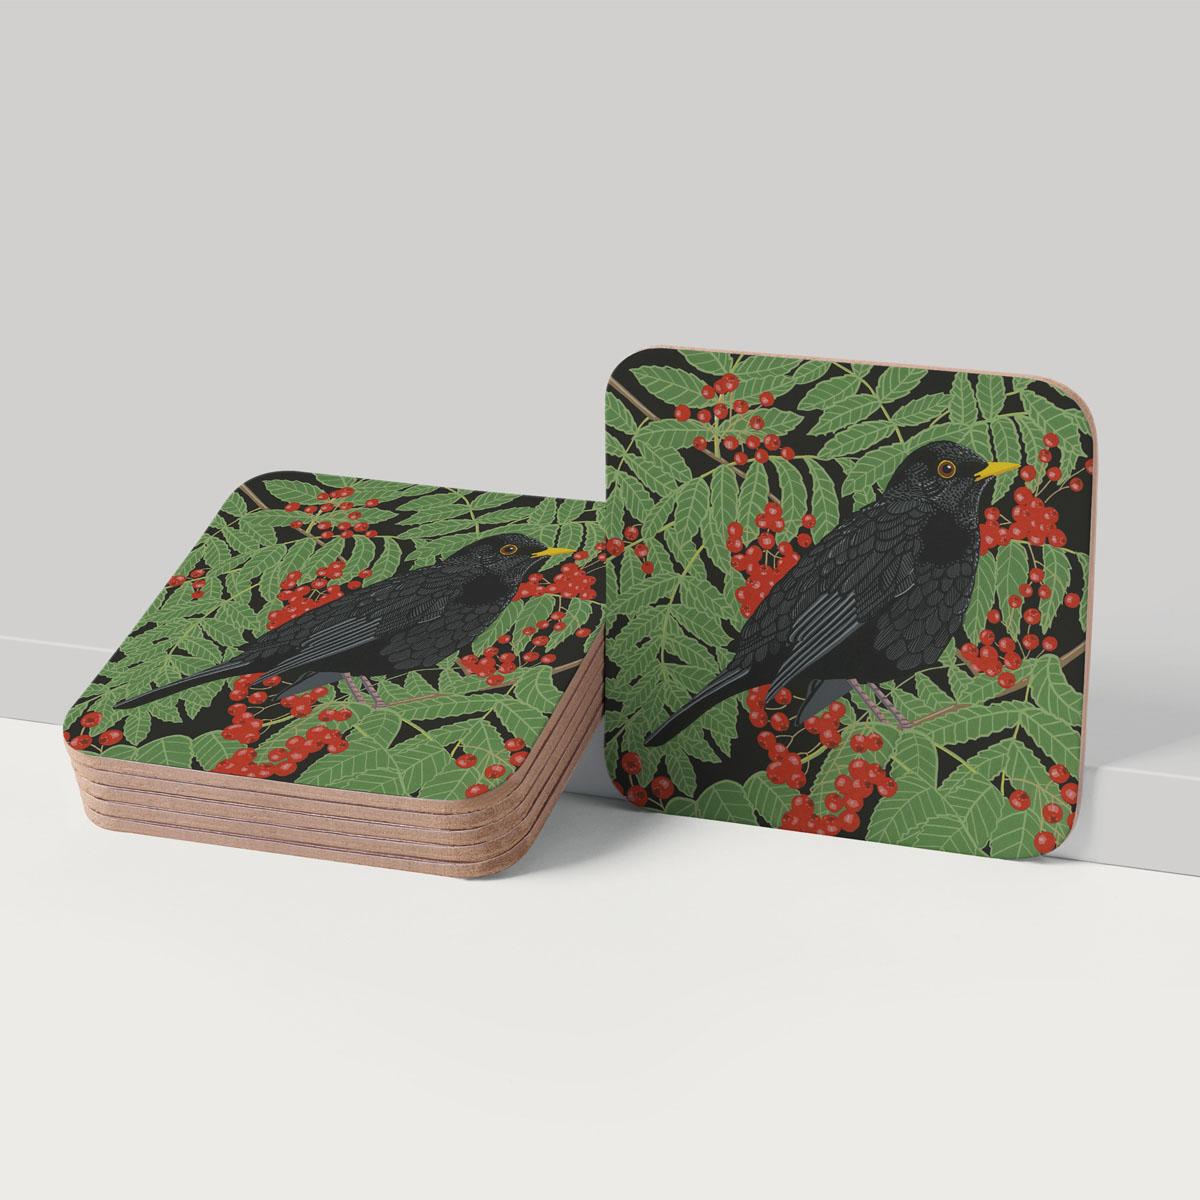 Blackbird Coaster Placemat Tableware